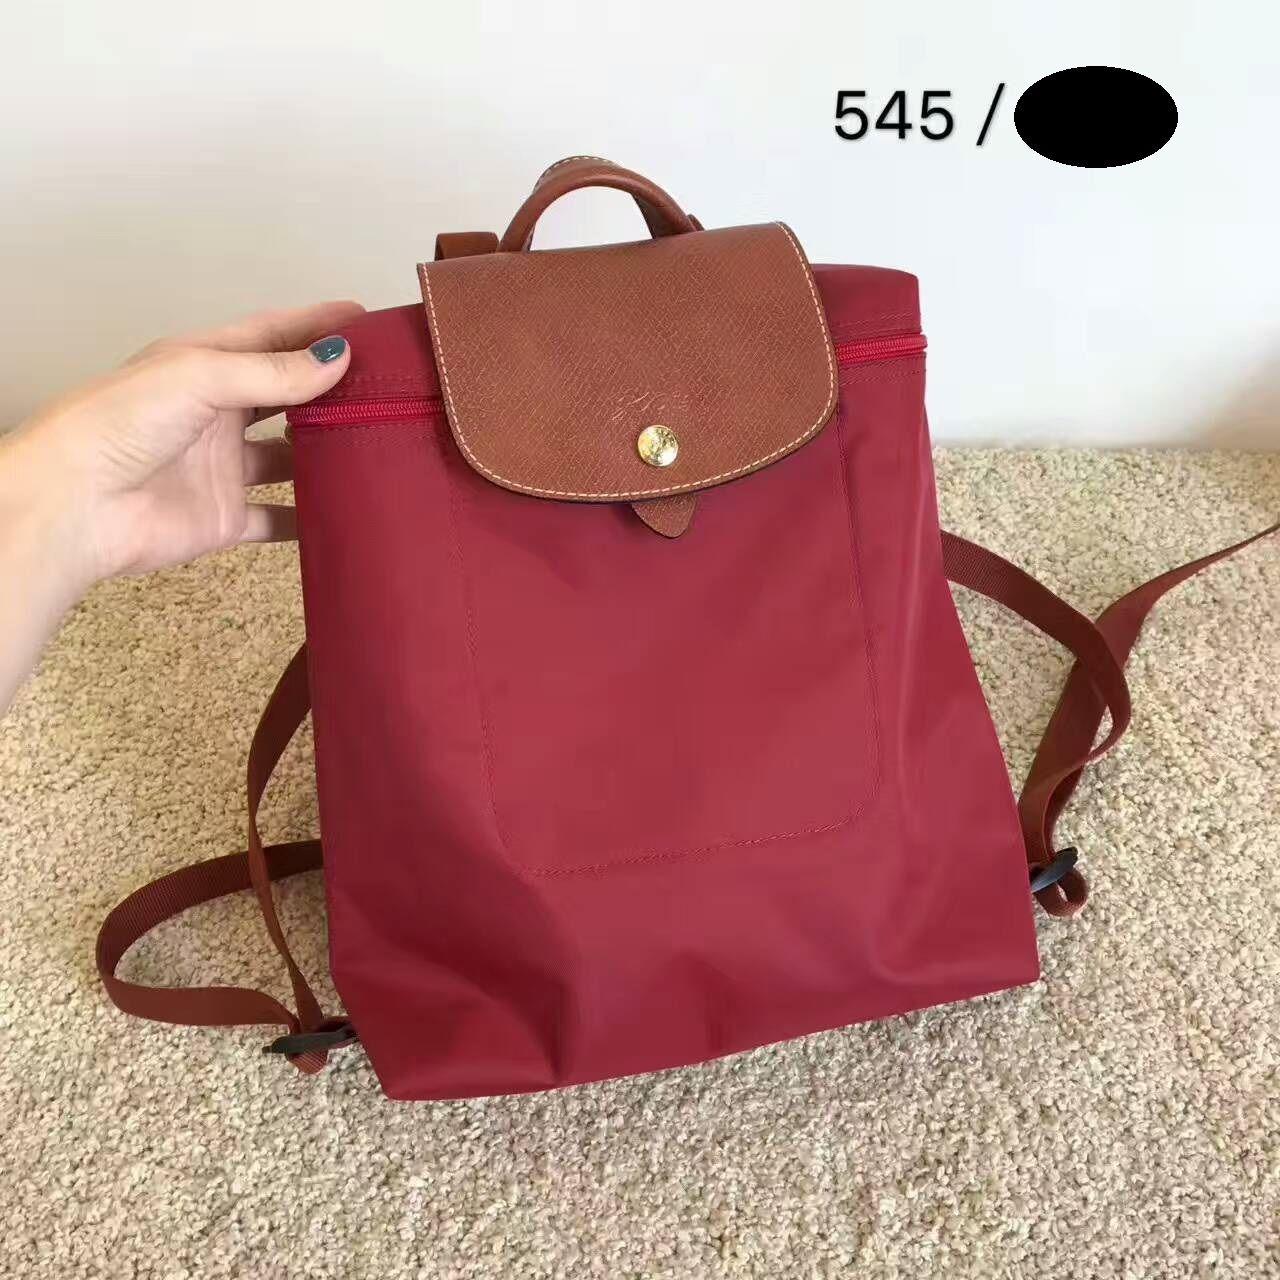 a929080c7d2e New Fashion Style Female Backpack High Quality Women Bag Original Material  Bag Girl School Style Bag Backpack Brands Rucksack Backpack From  Easonyang2016